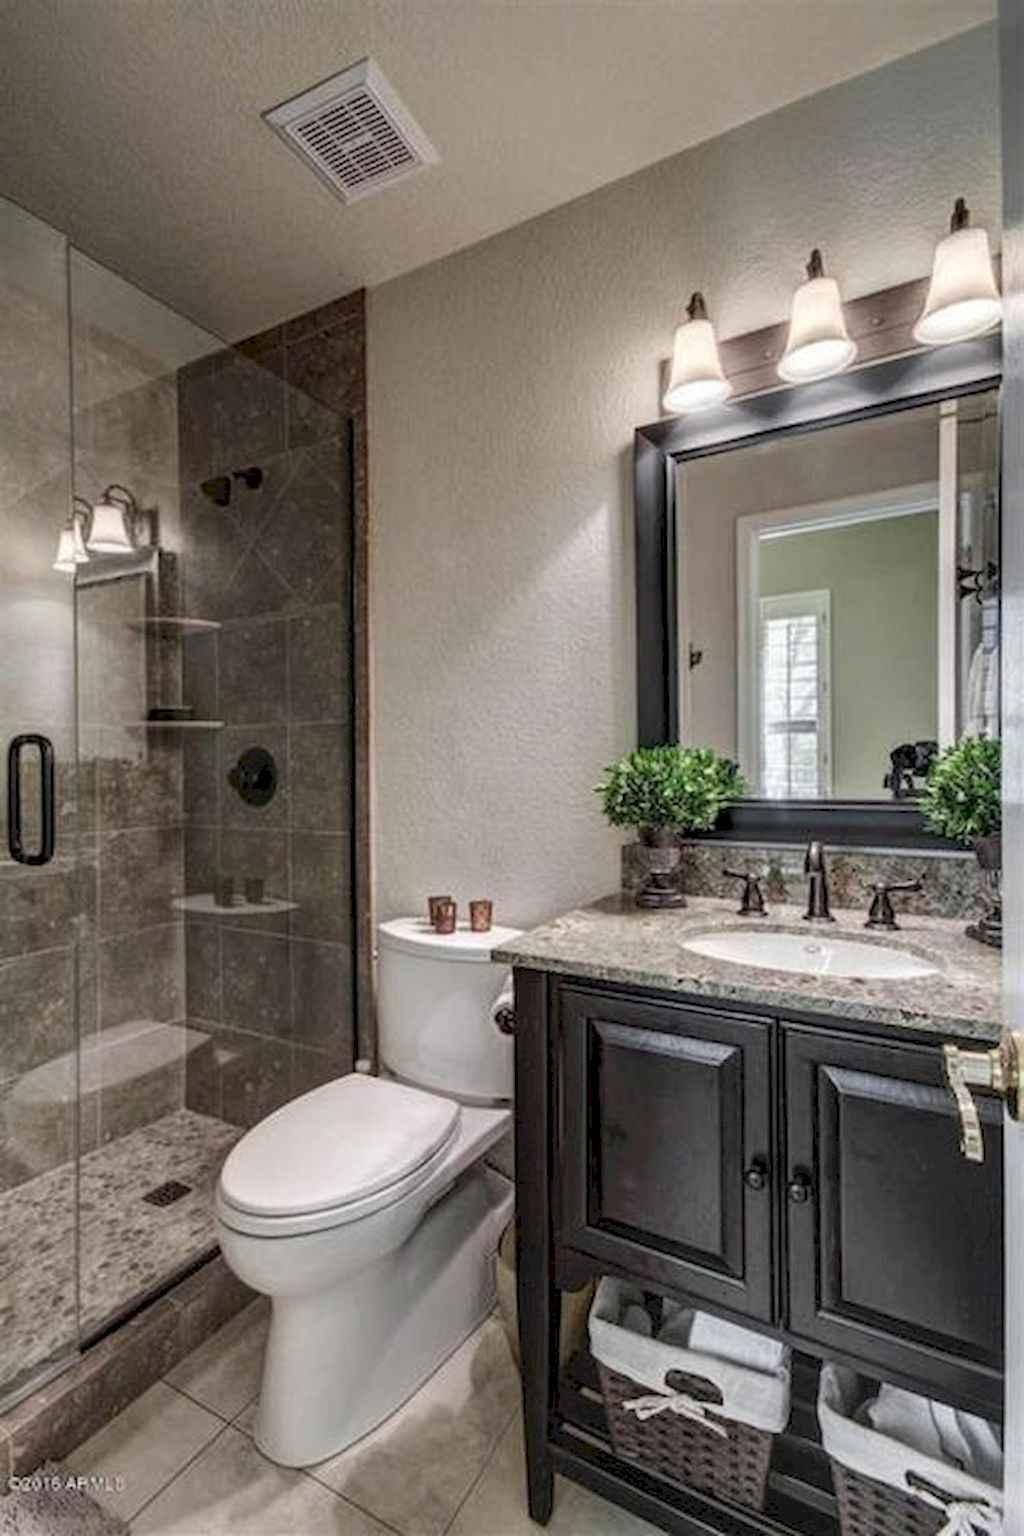 111 Brilliant Small Bathroom Remodel Ideas On A Budget (5)